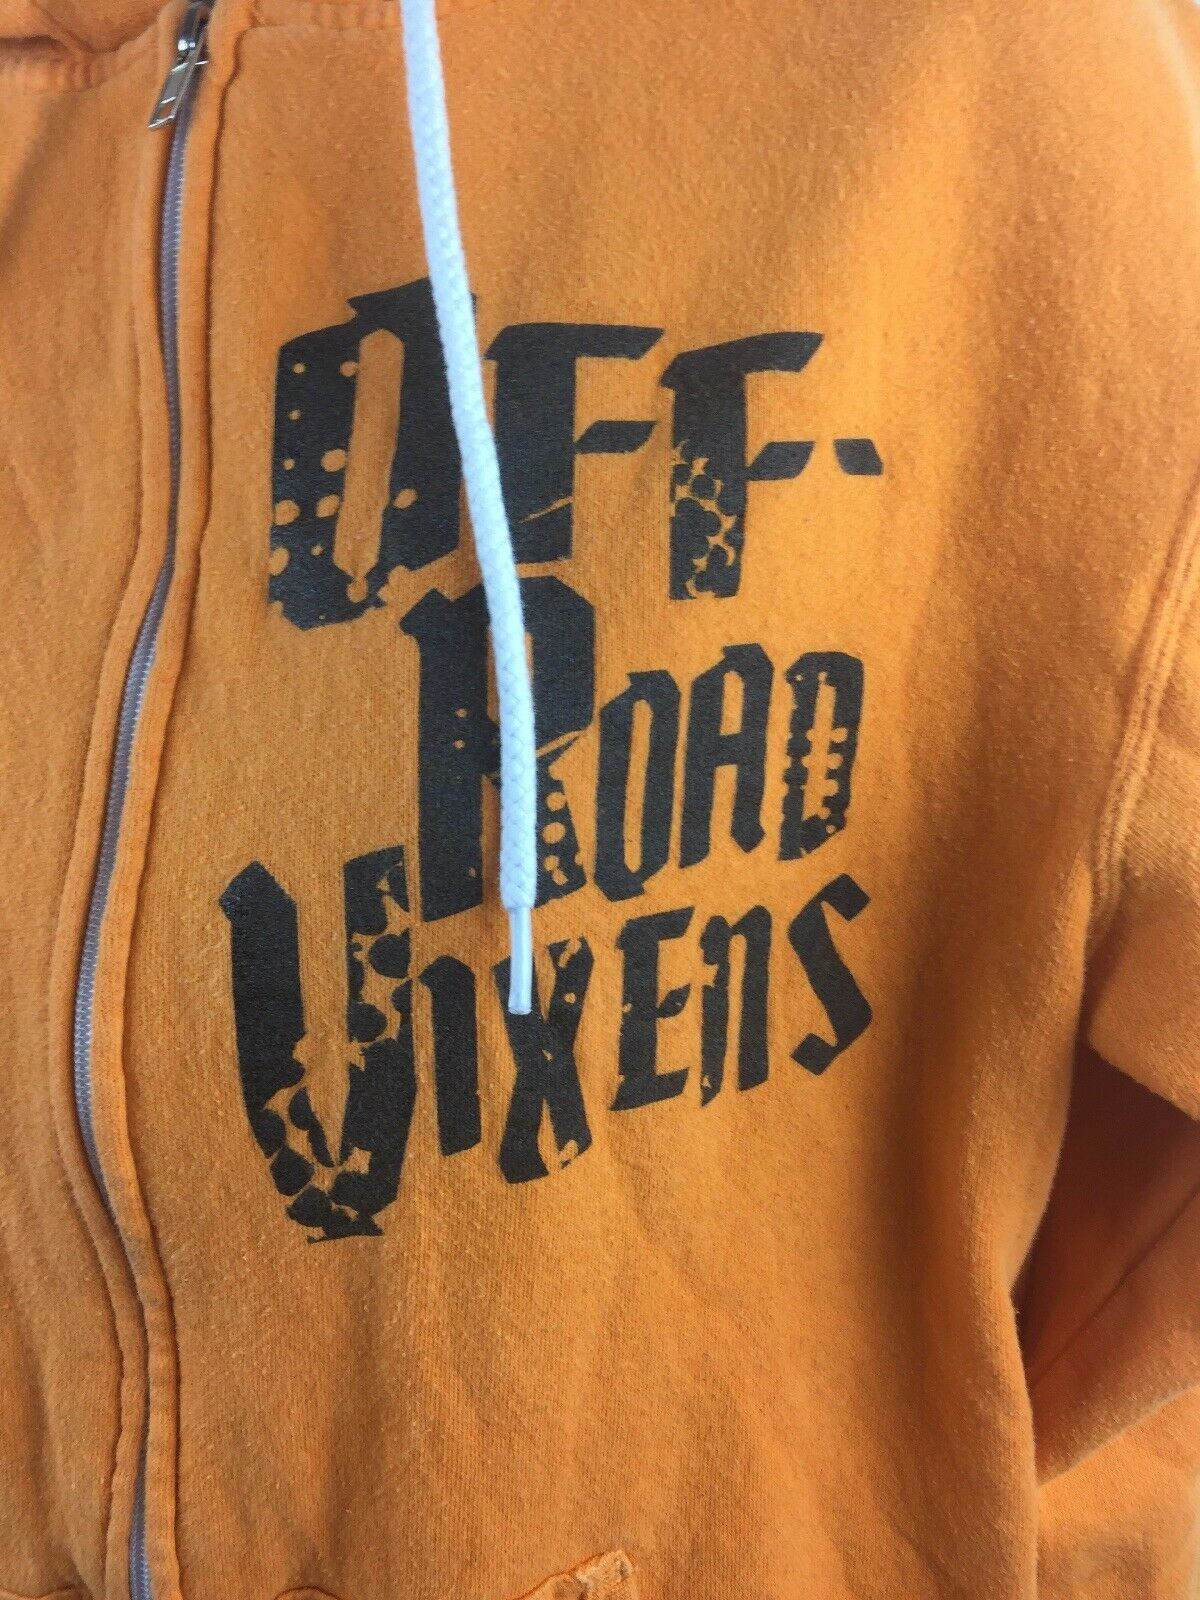 Off-Road Vixens Cotton Poly Orange Hooded Zipper Sweatshirt Size M image 2